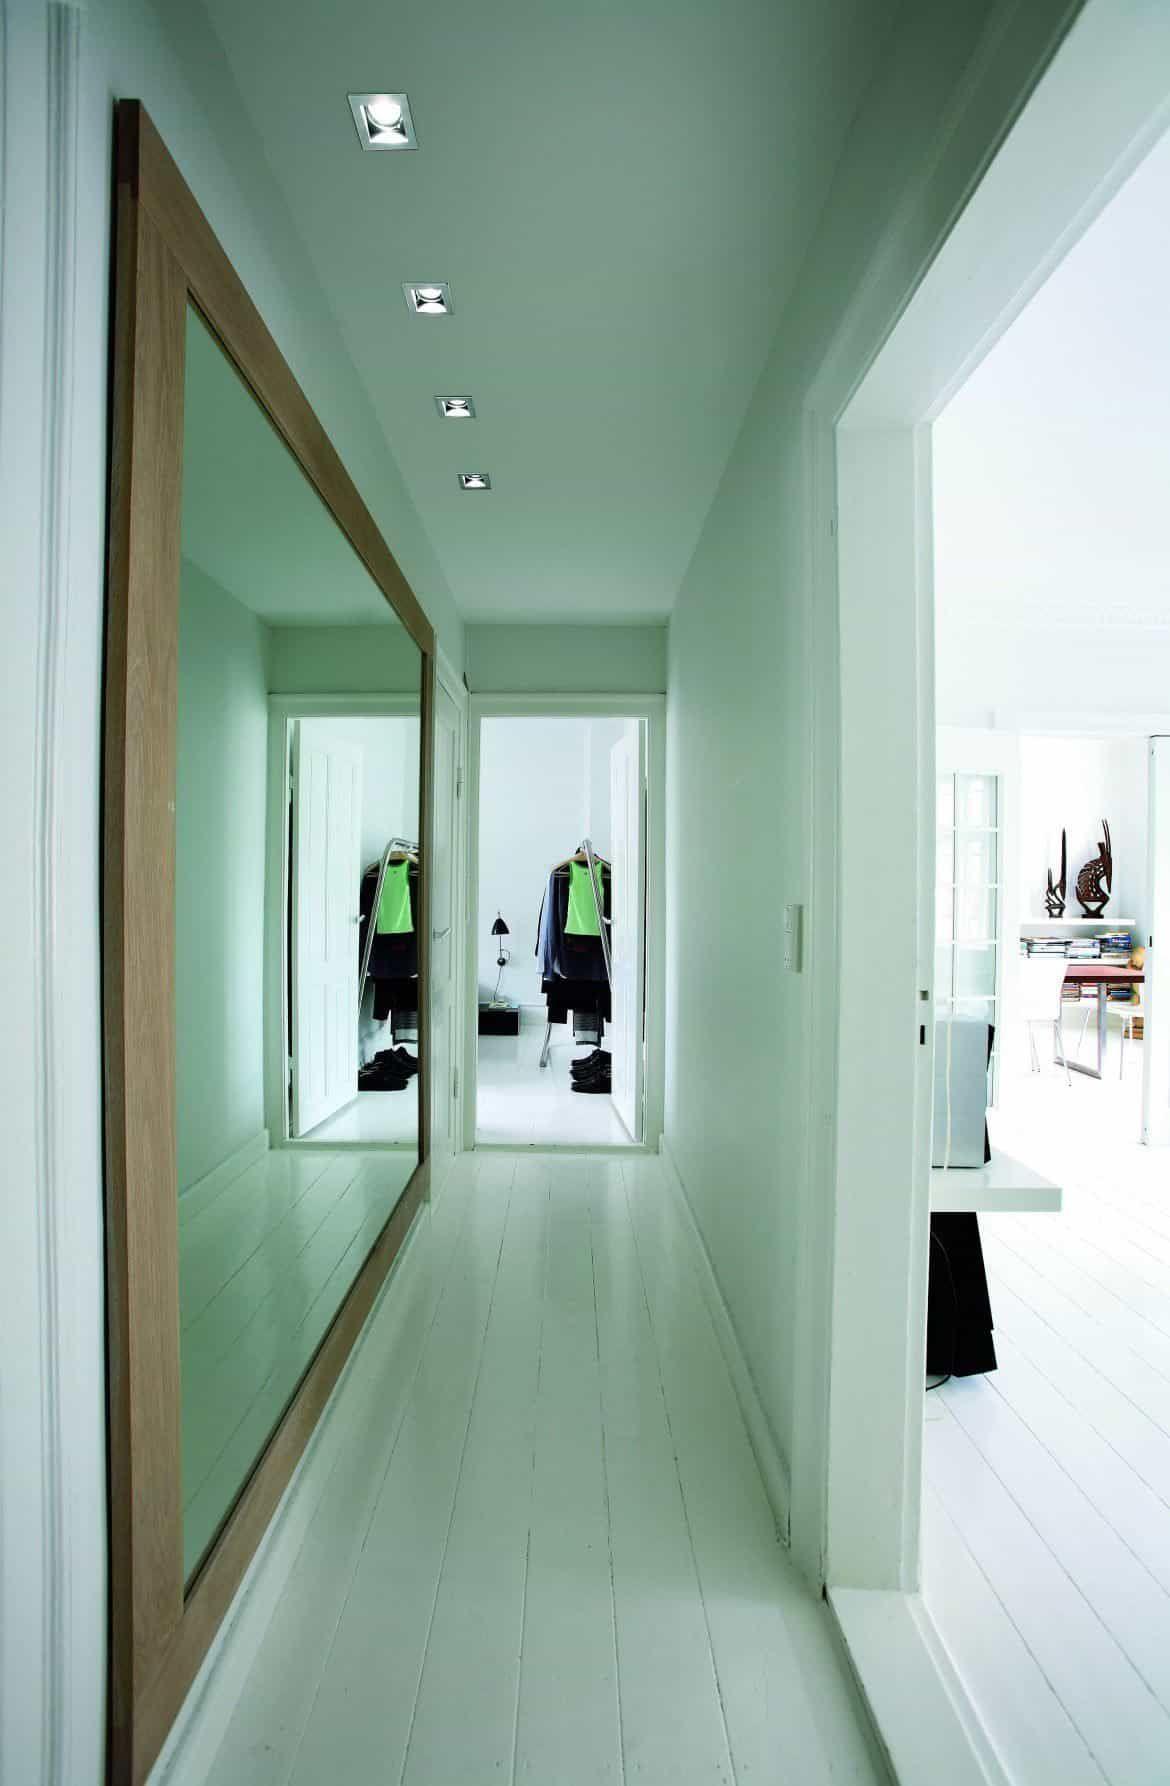 Hallway Mirrors Can Brighten The Space Hallway Mirror Narrow Hallway Decorating Hallway Decorating